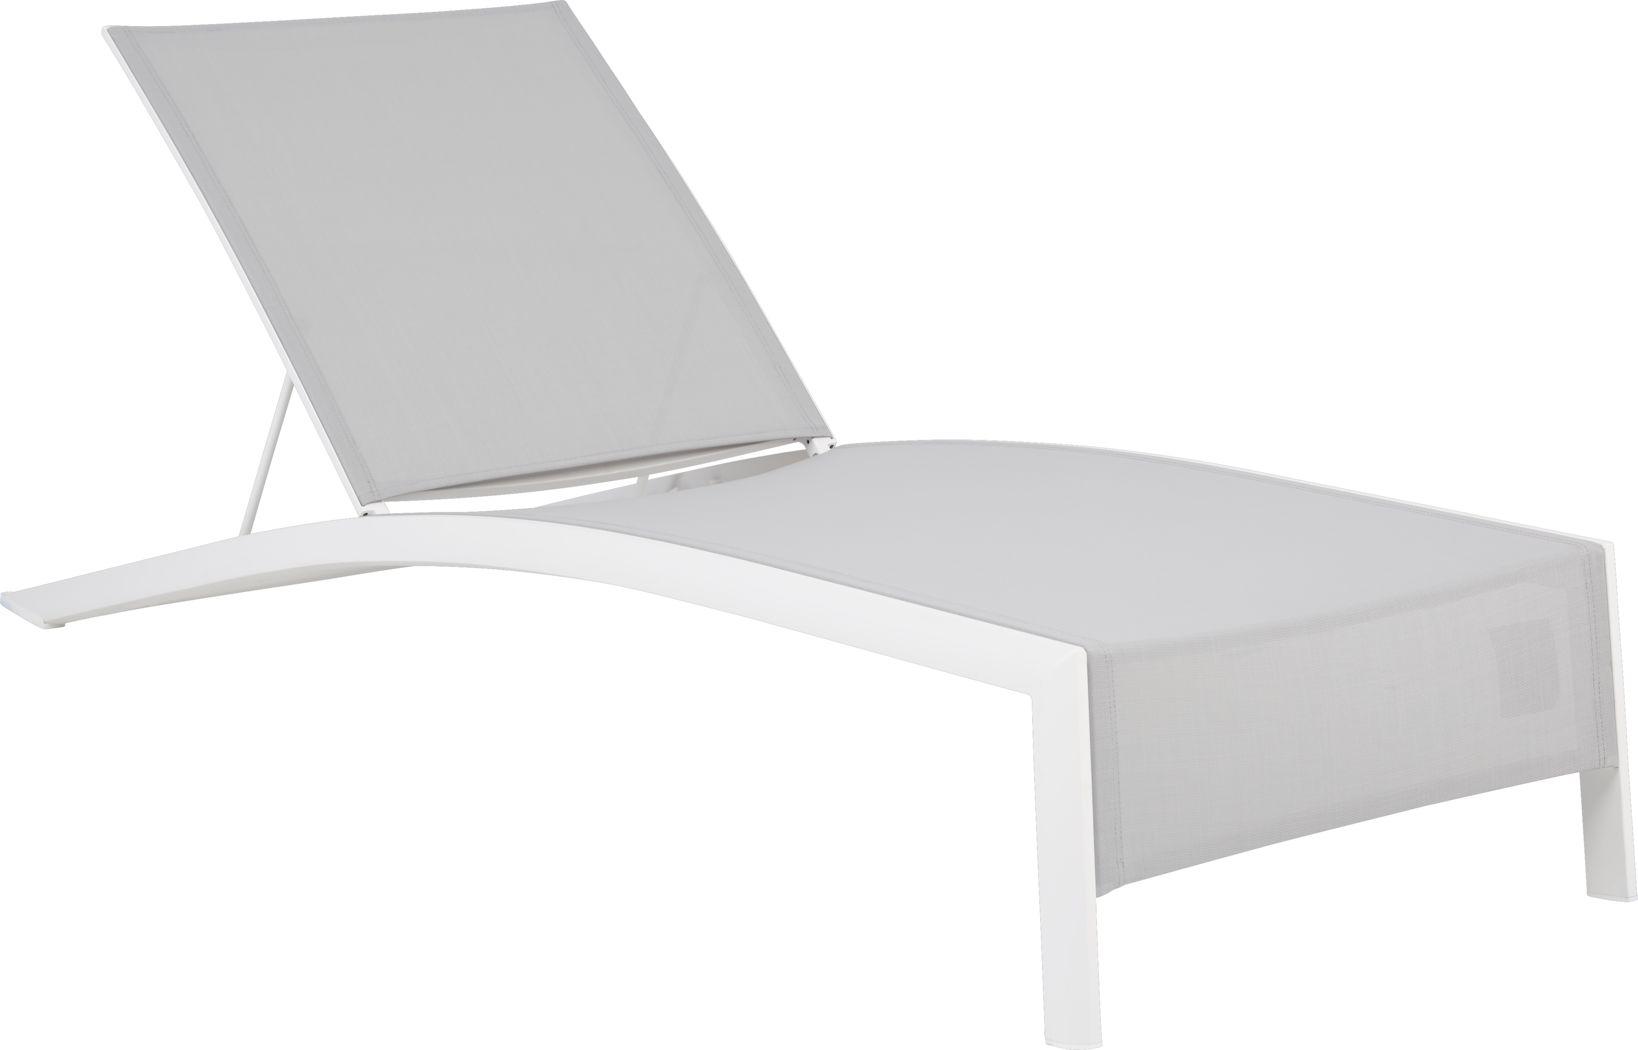 Seagate White Outdoor Chaise